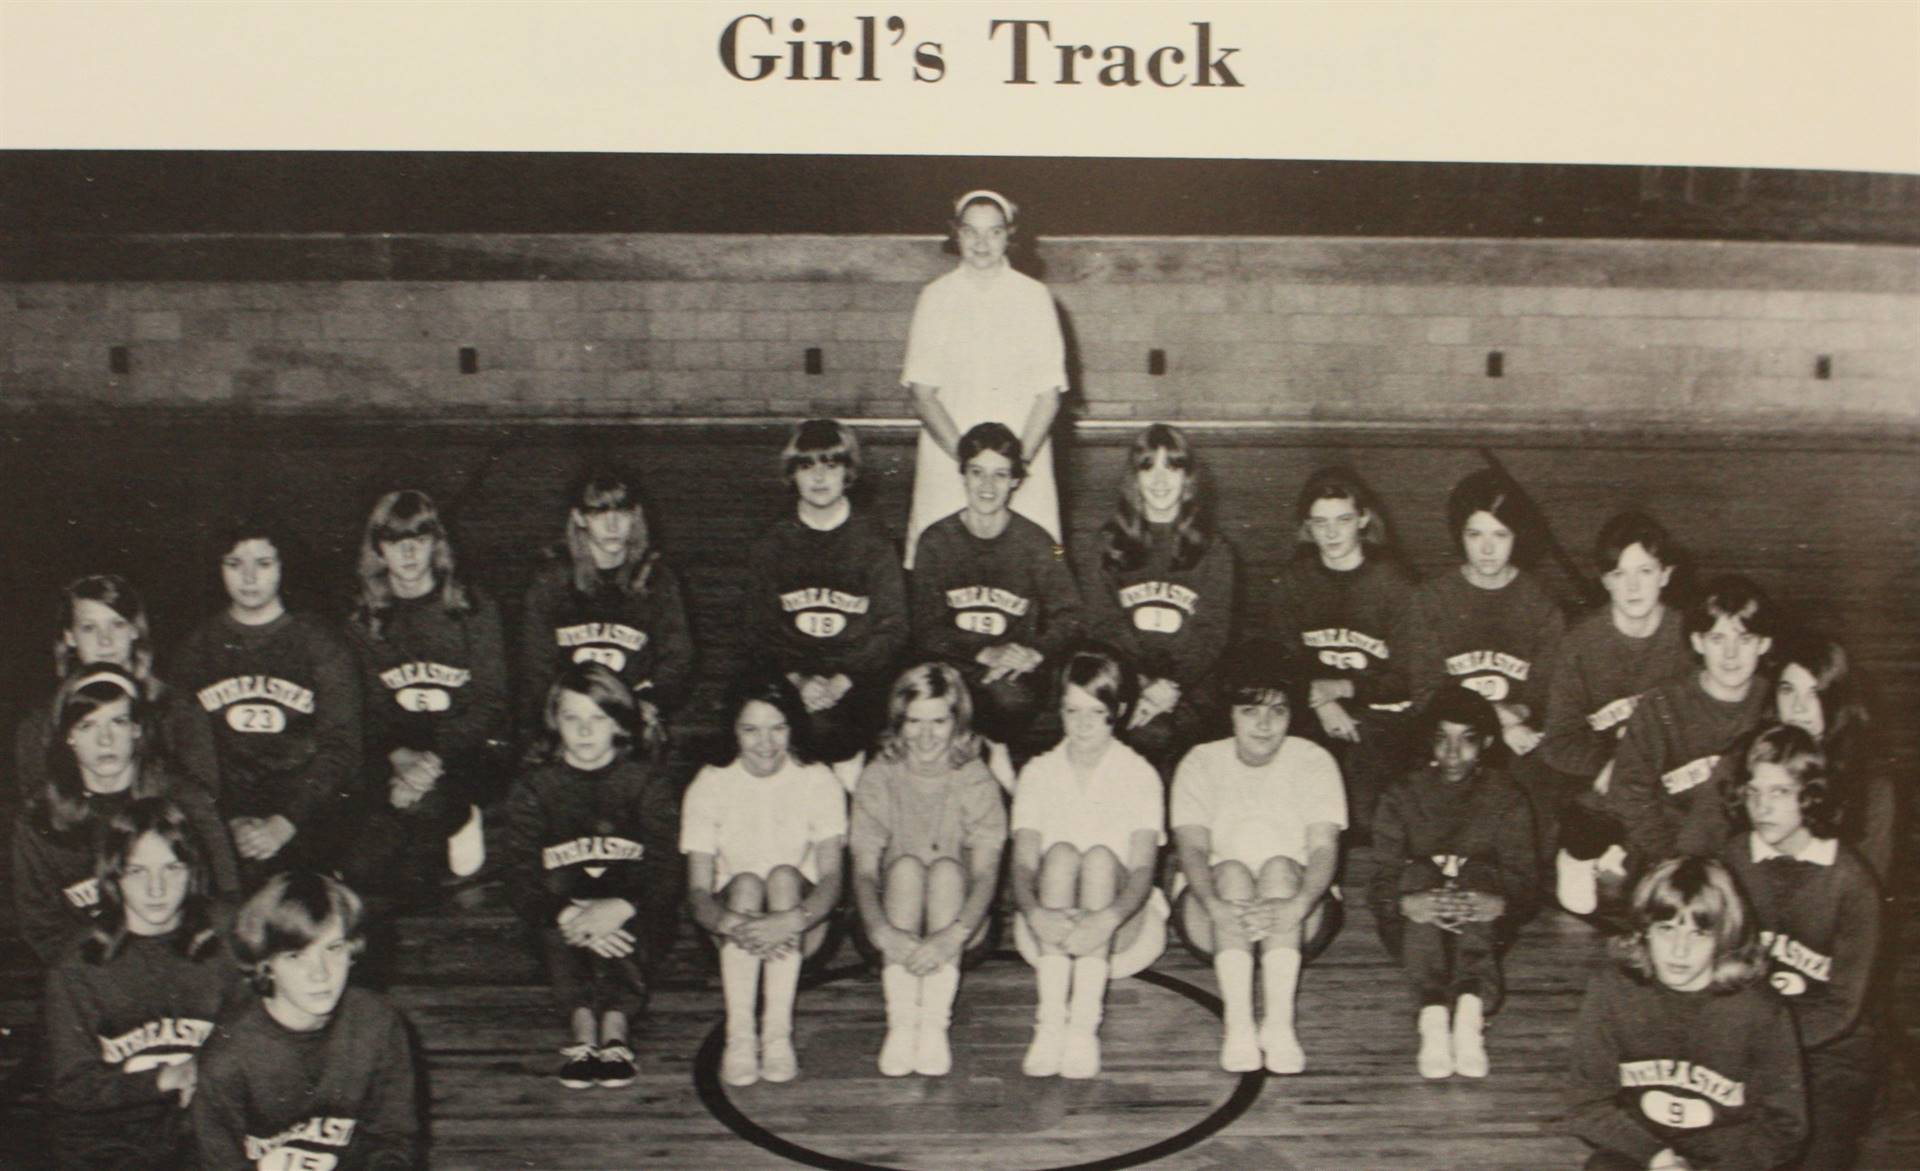 1968 Girl's Track